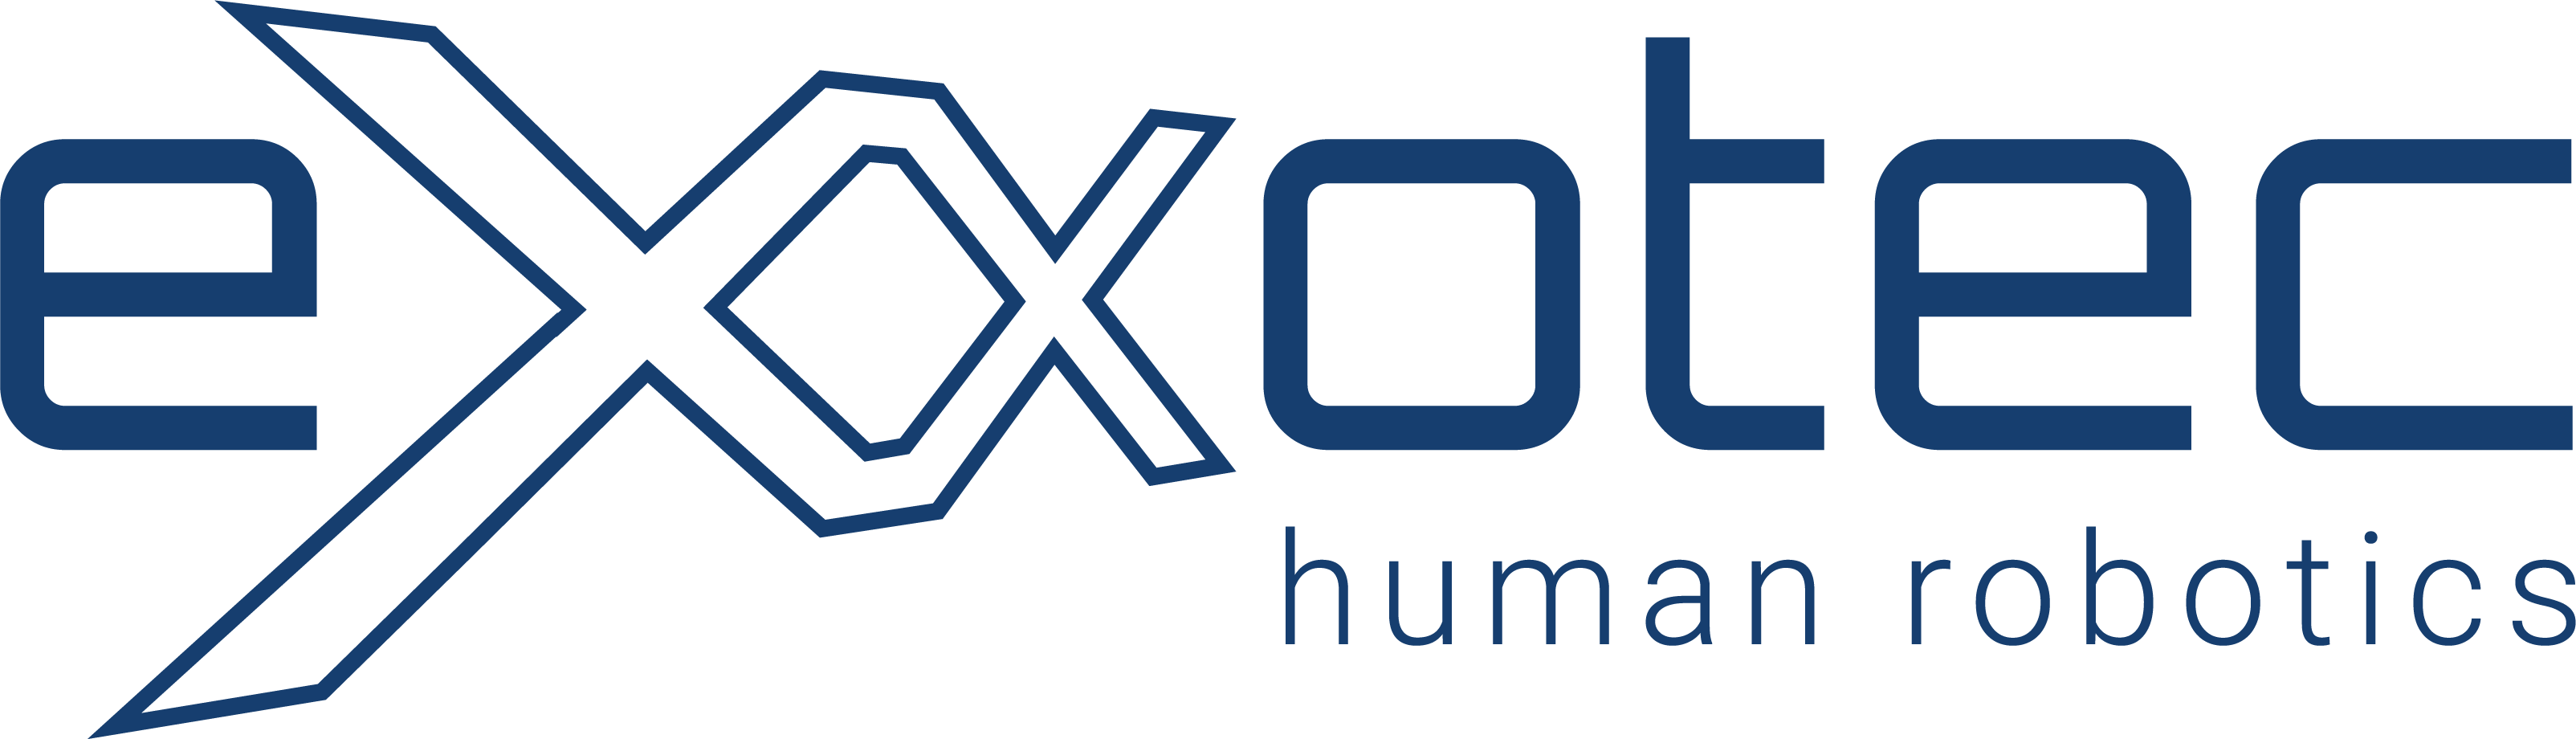 Logo exxotec